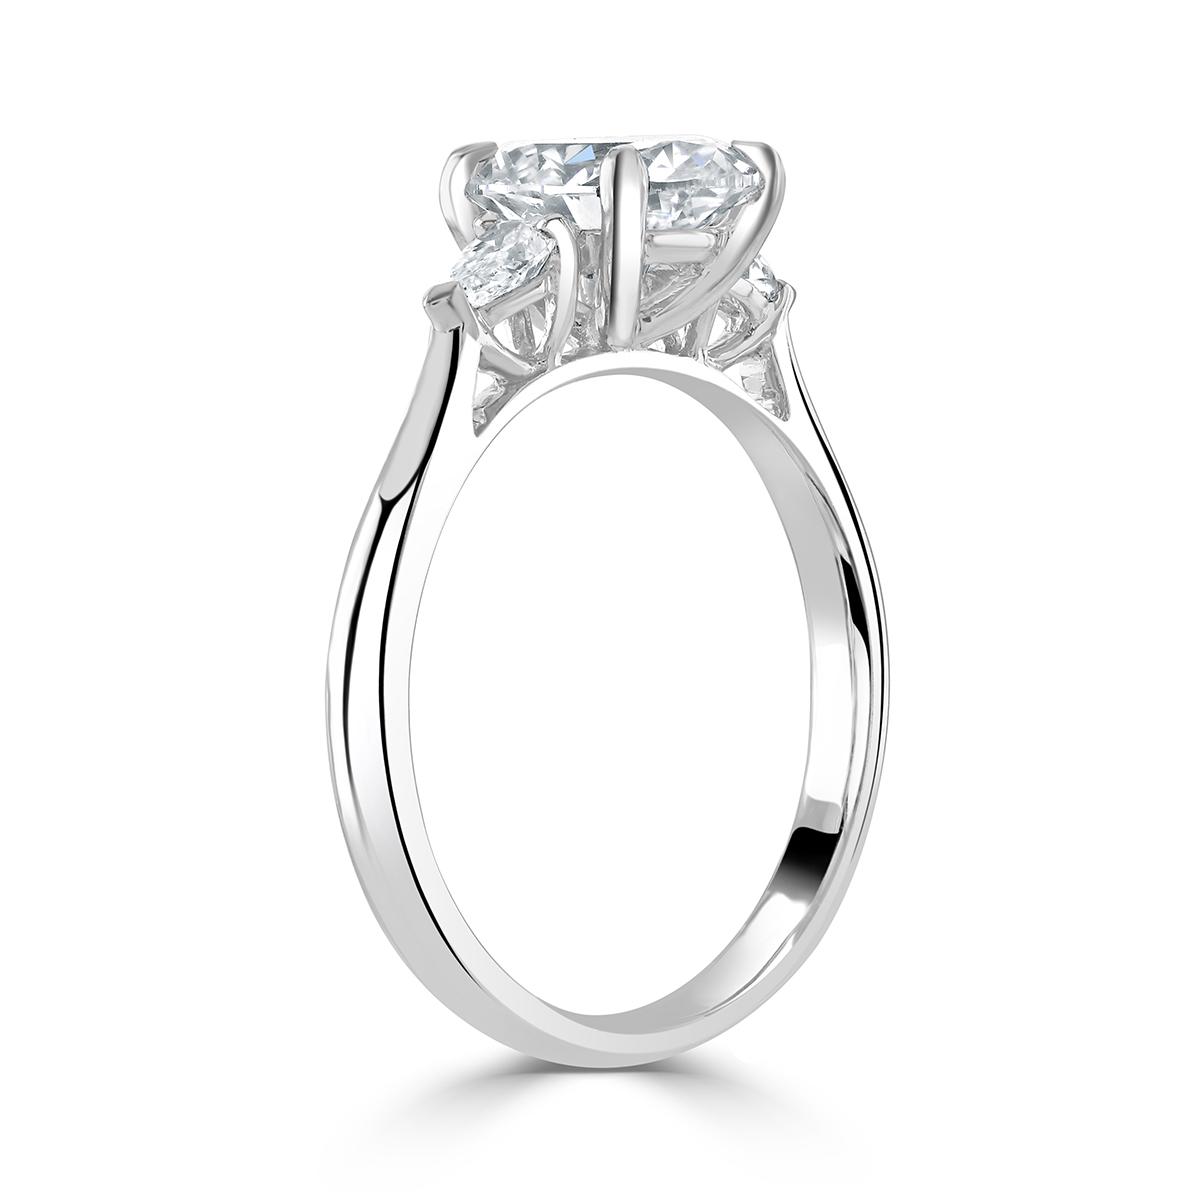 Oval Cut Platinum Diamond Trilogy Ring